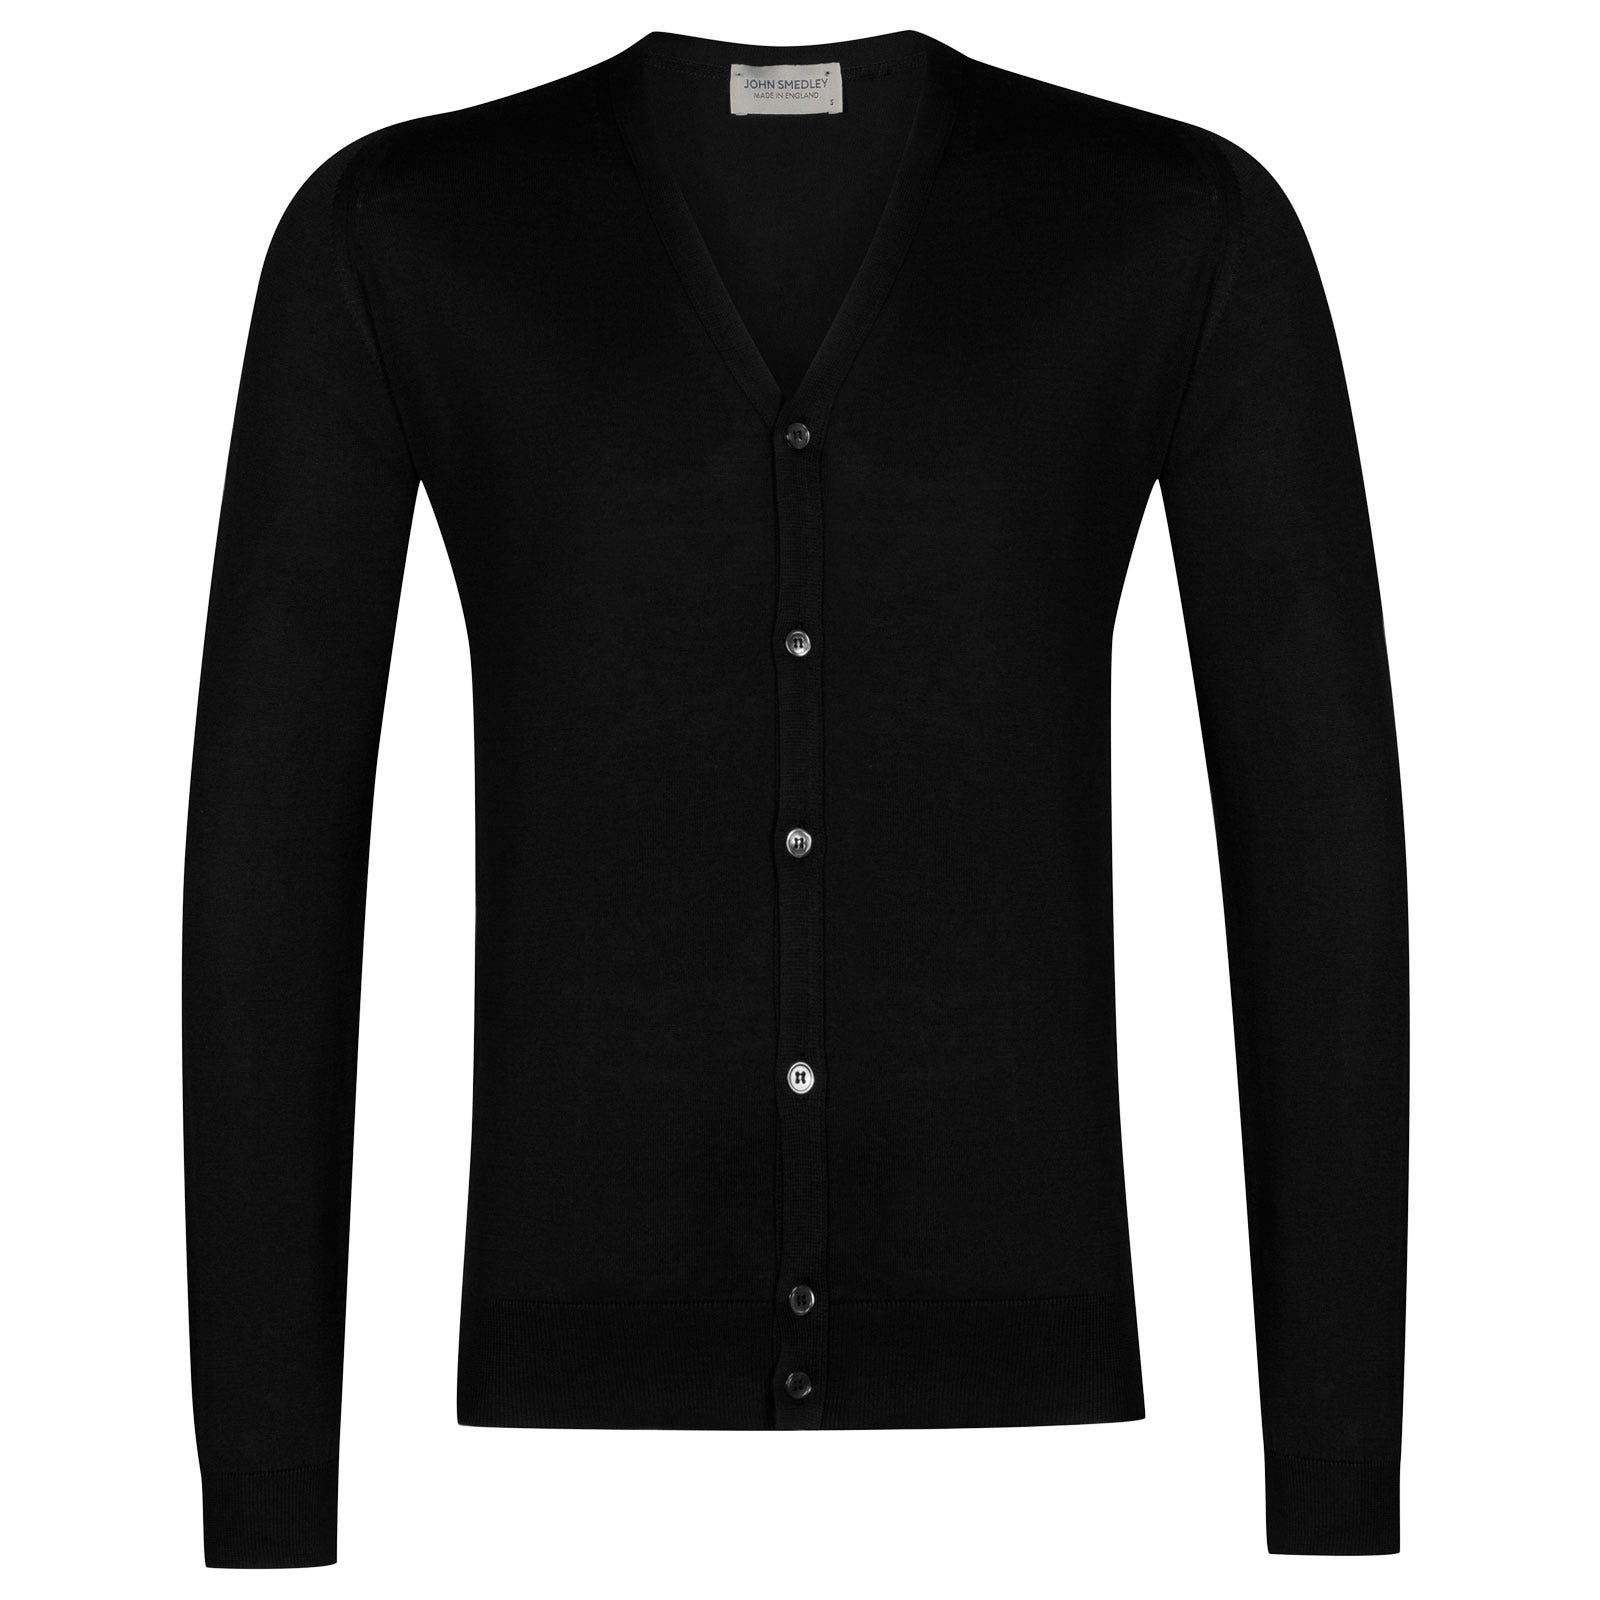 John Smedley whitchurch Sea Island Cotton Cardigan in Black-L